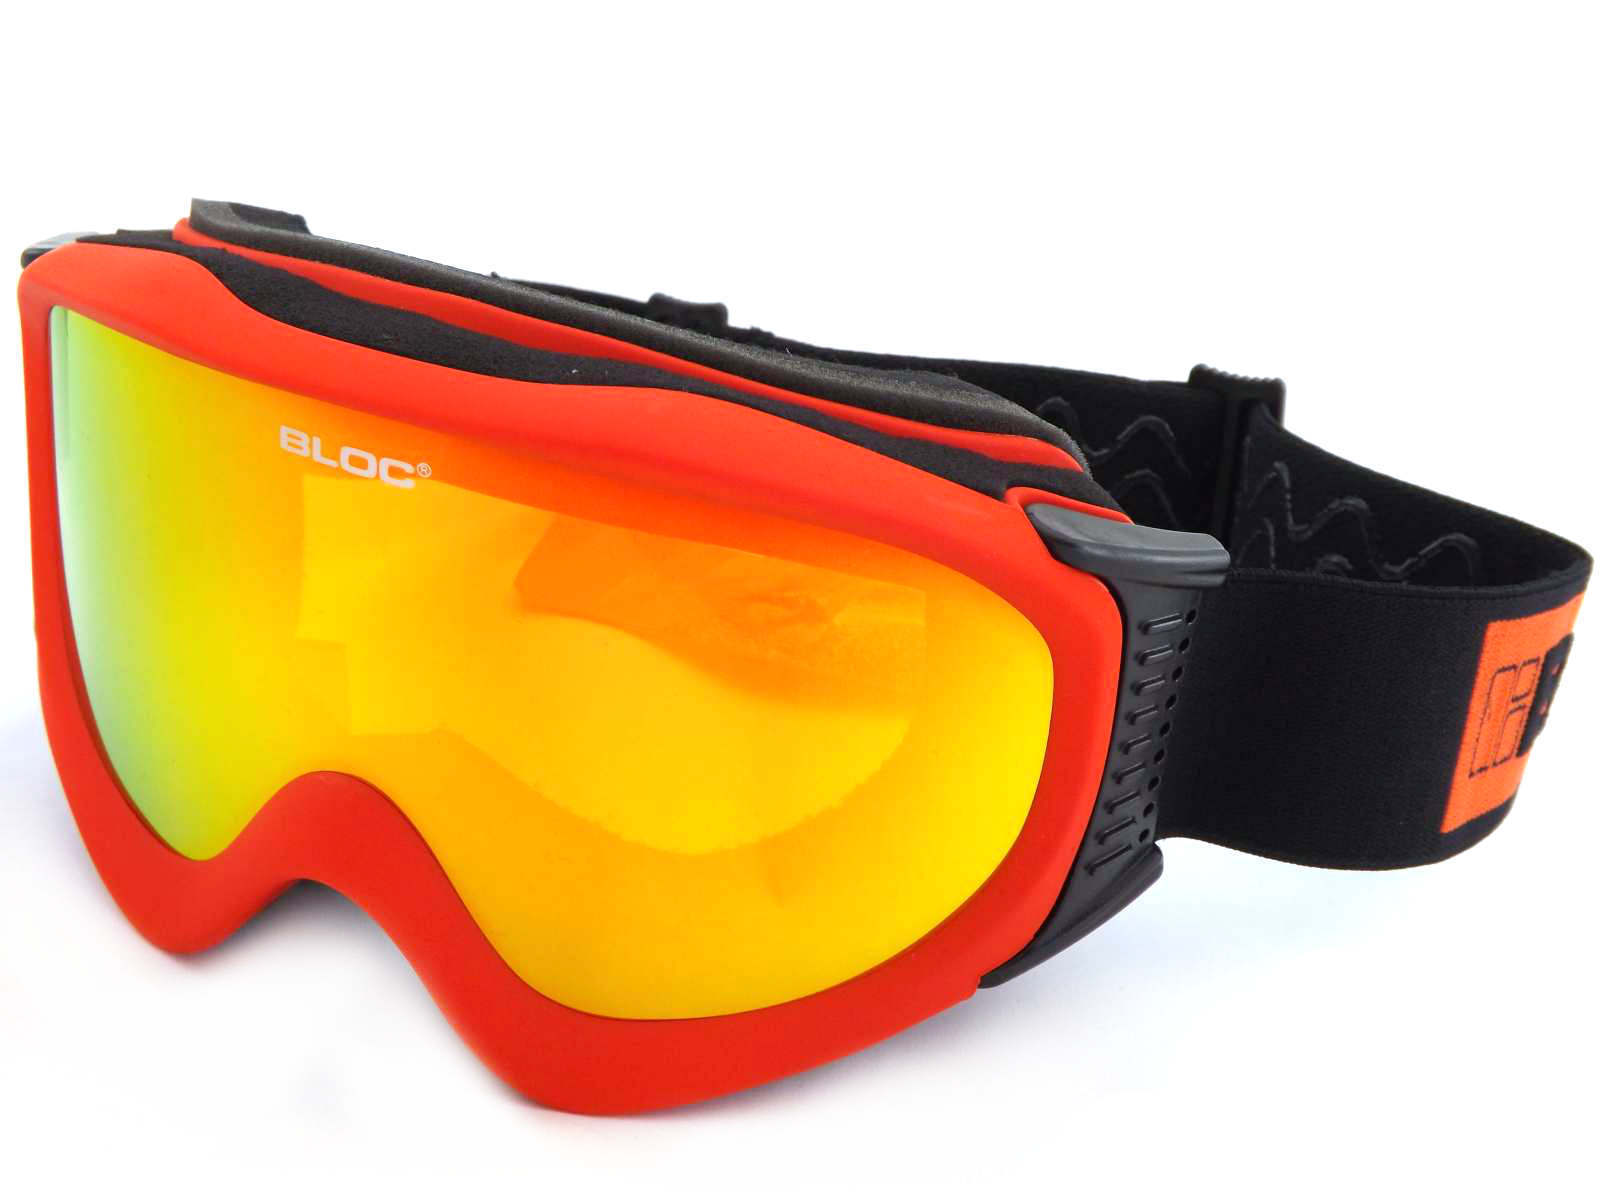 BLOC - ICE ski snowboard Goggles MATT RED  Red Mirror Cat.3 Lens ICE07